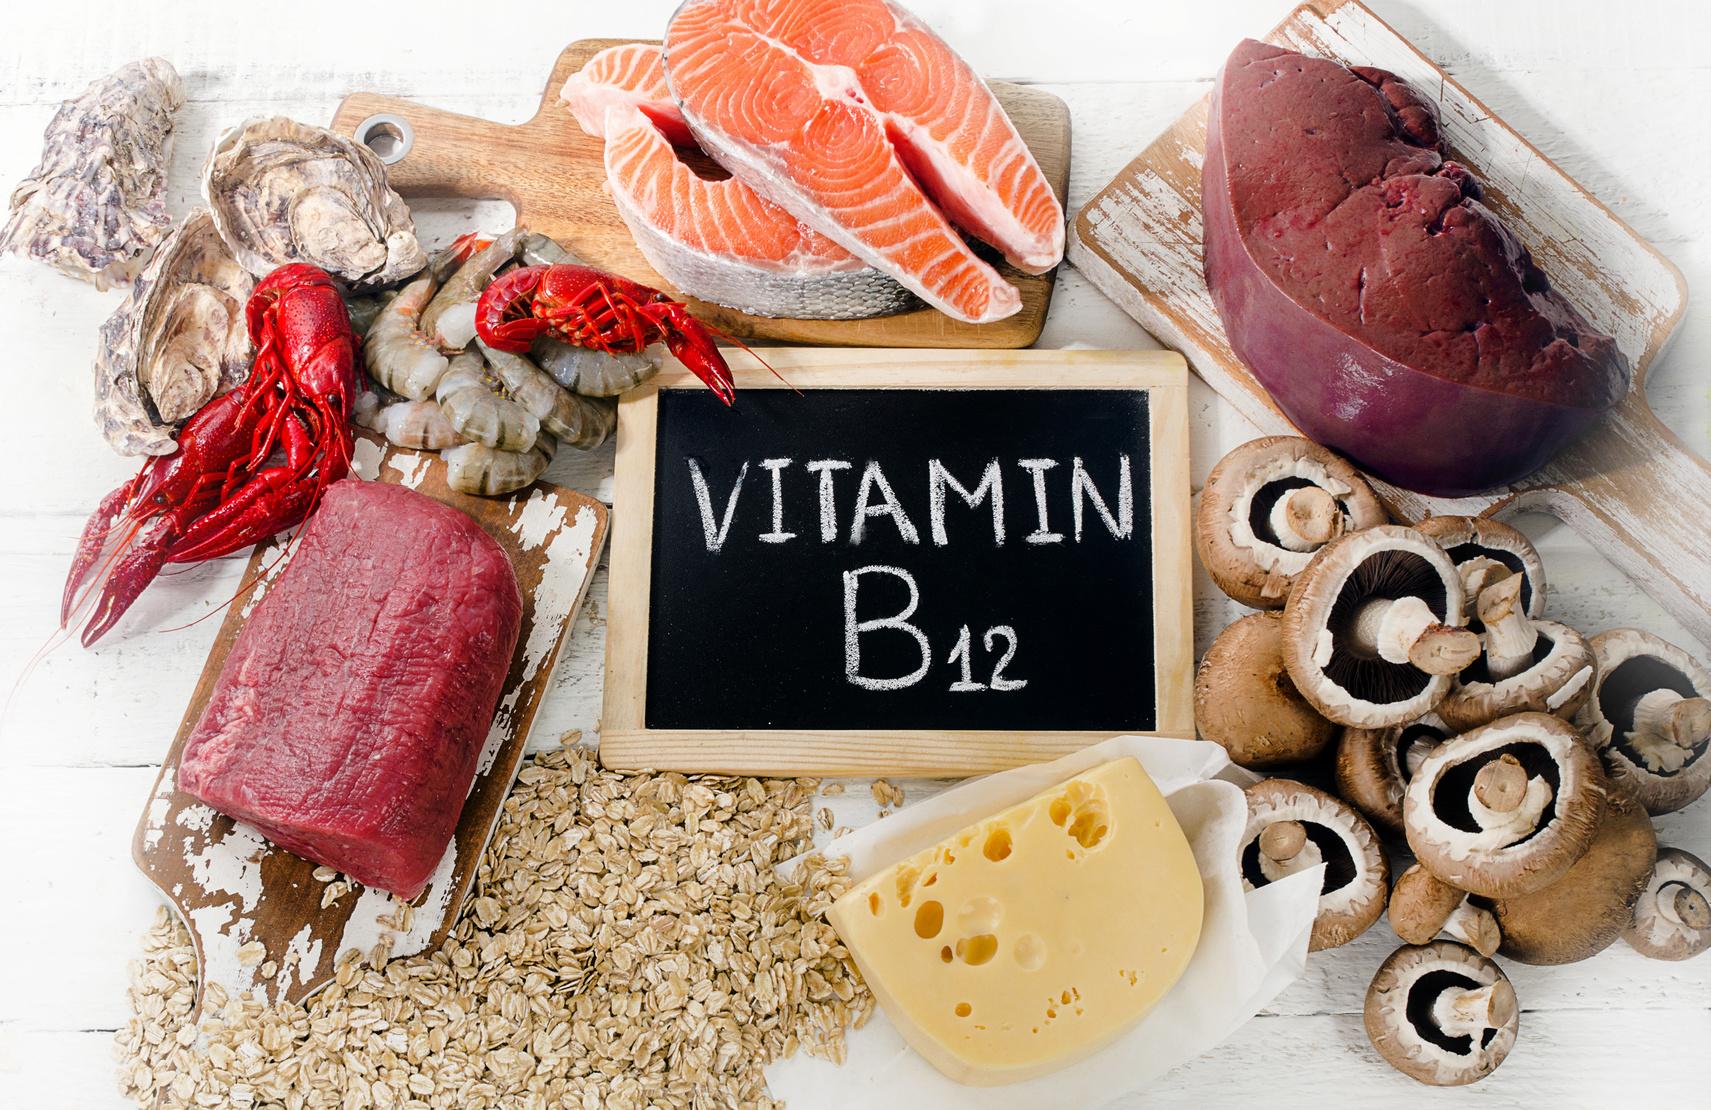 عوارض ویتامین b12